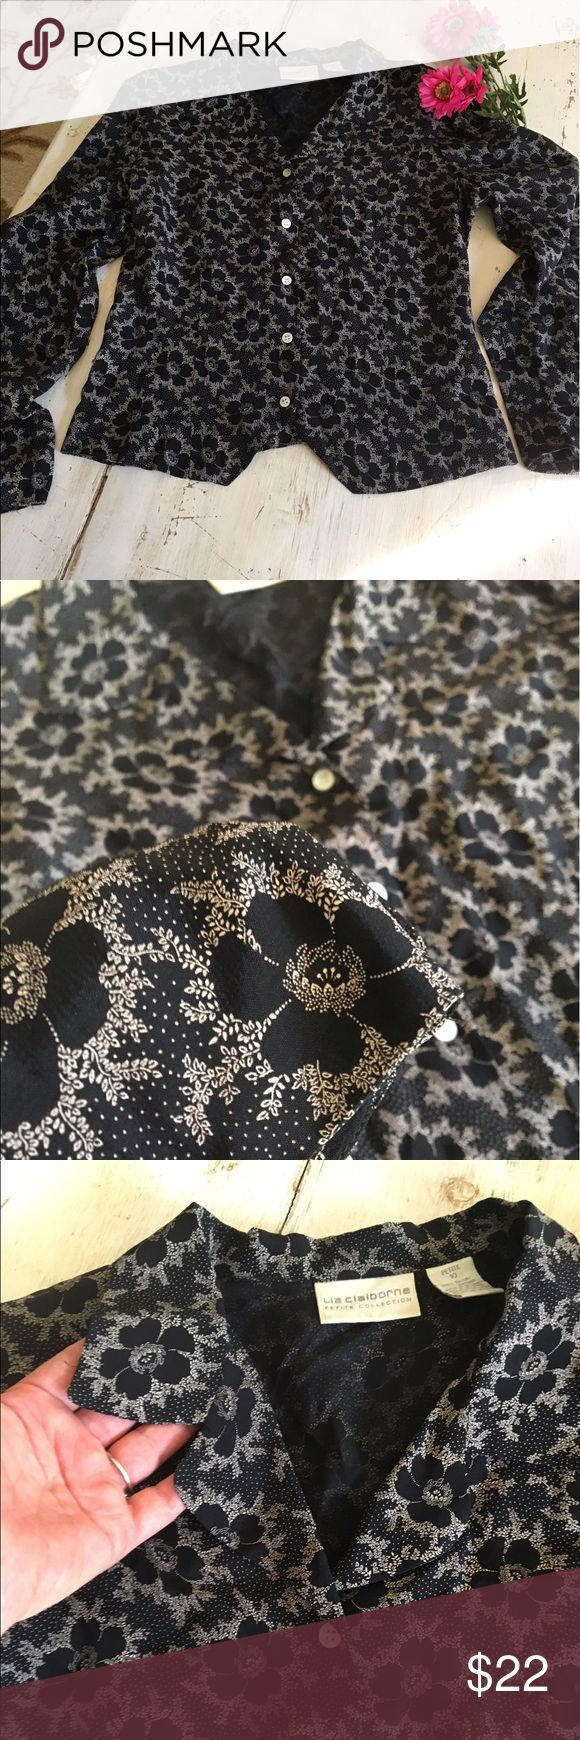 Liz Claiborne Petite Blouse Beautiful Liz Claiborne petite collection blouse size 10 in black and tan. Both feminine and classic looking. Liz Claiborne Tops Blouses